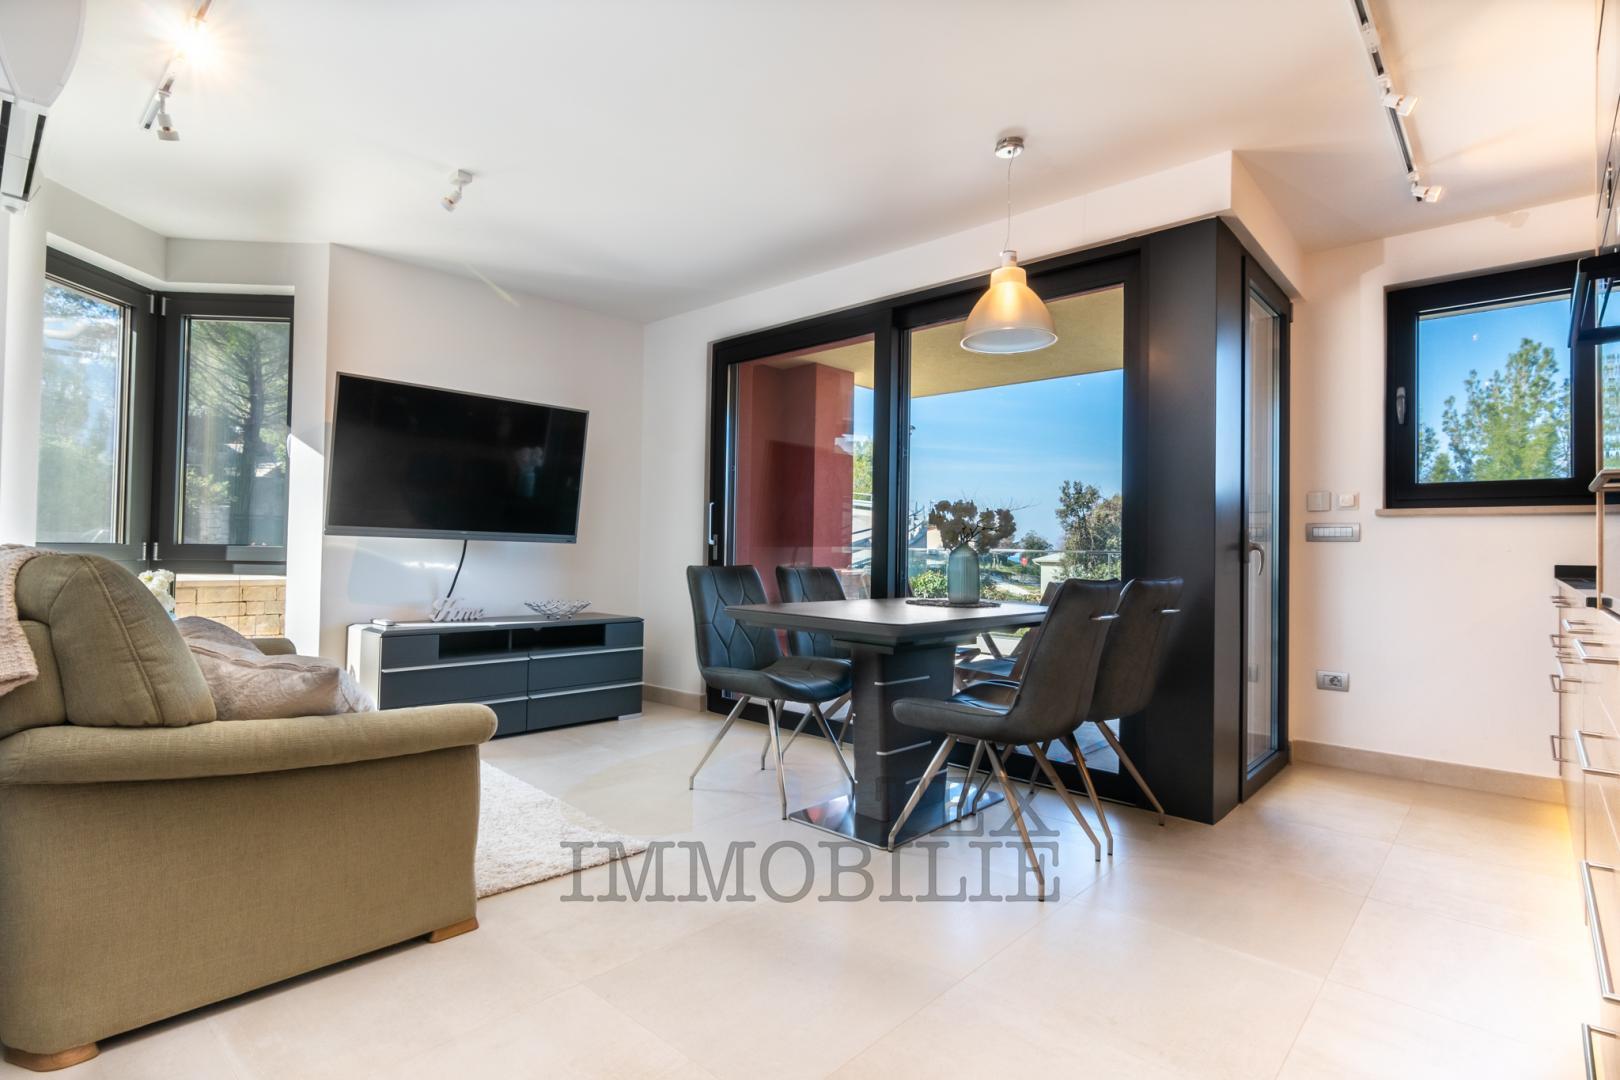 Vrsar - luksuzno stanovanje ob morju